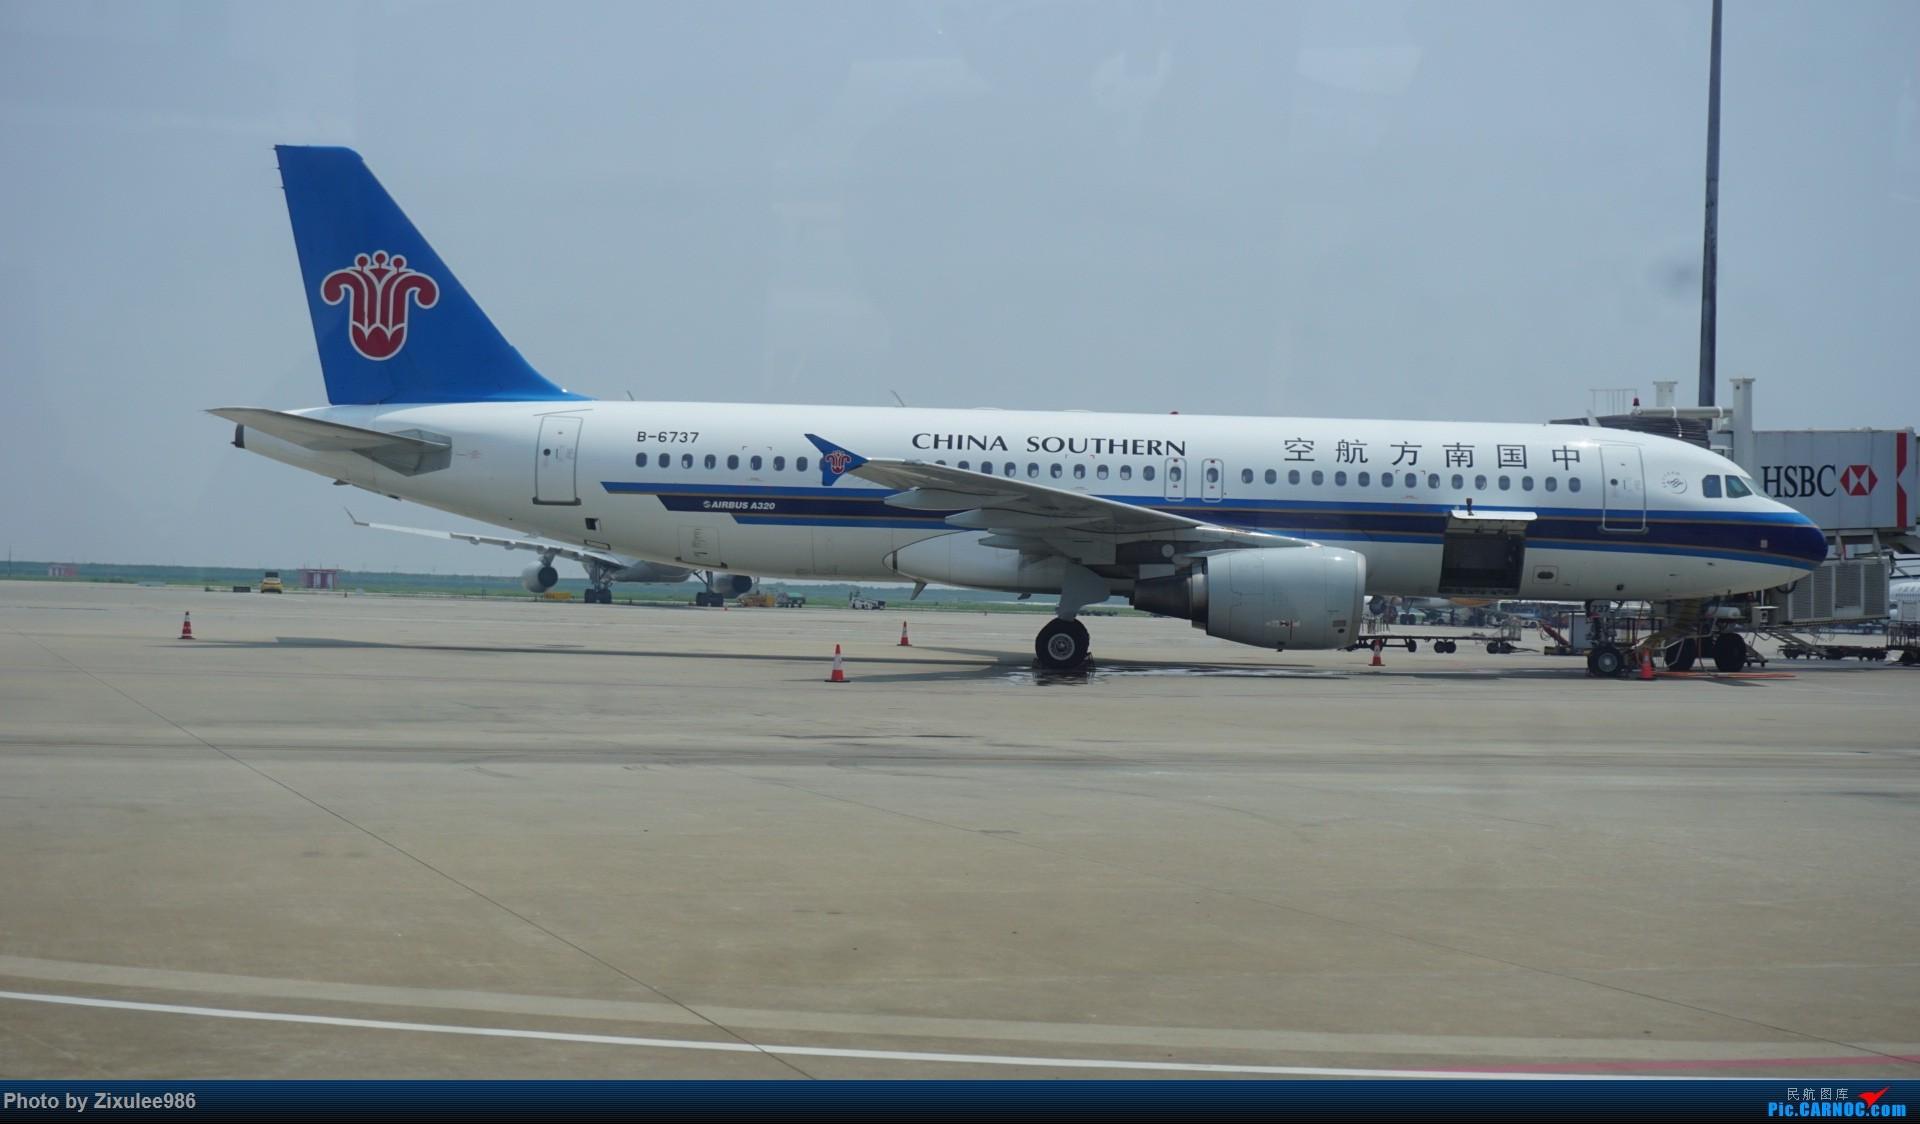 Re:[原创]加拿大21日游学之旅(一)~JJN-PVG-YYZ..(内含flightlog)~第一次发游记~多图缓更请谅解 AIRBUS A320-200 B-6737 中国上海浦东国际机场